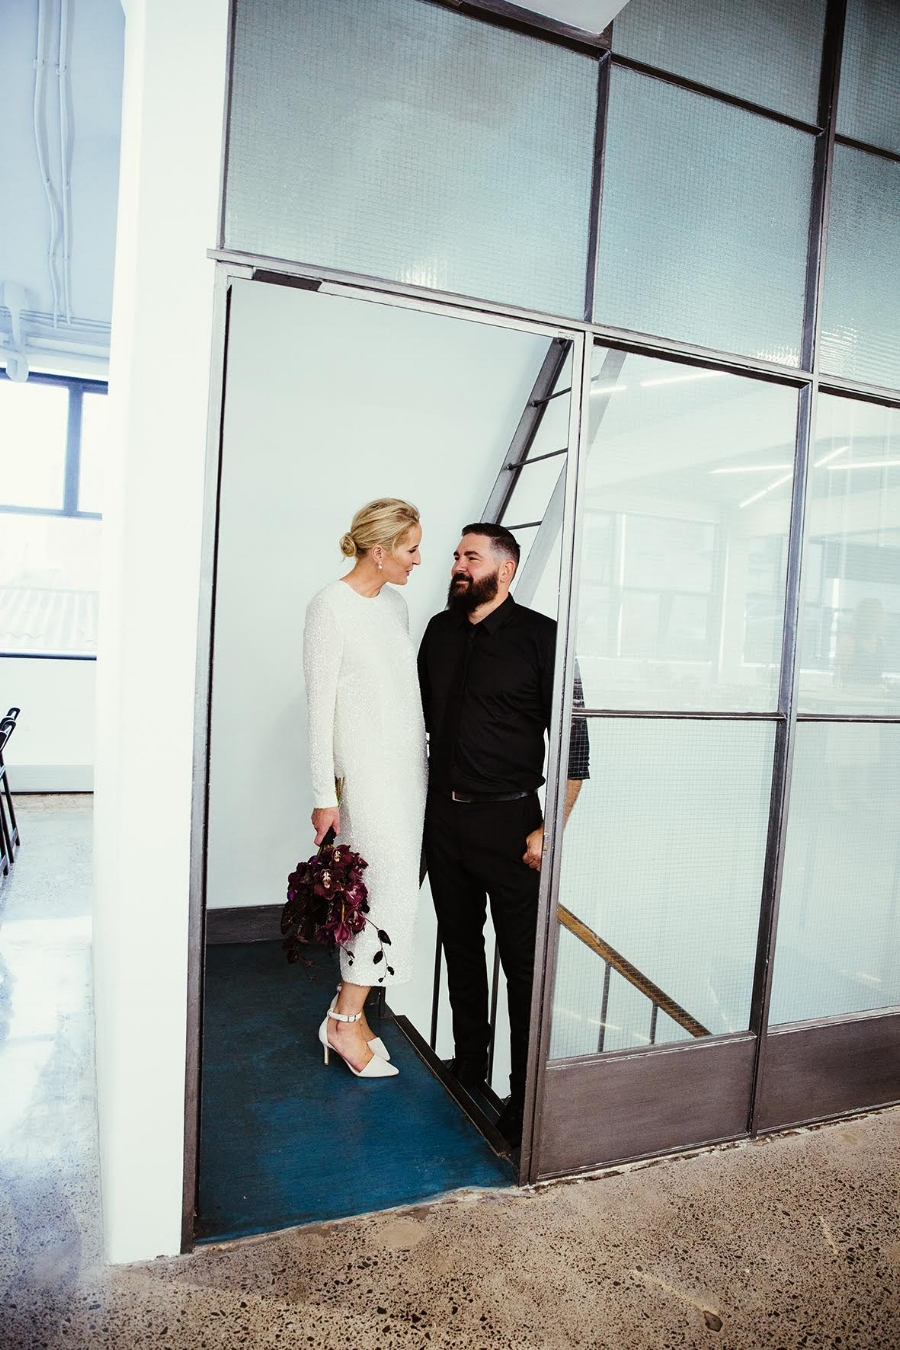 Juliette Hogan and Husband Dion on their wedding day - Image Olivia Hemus